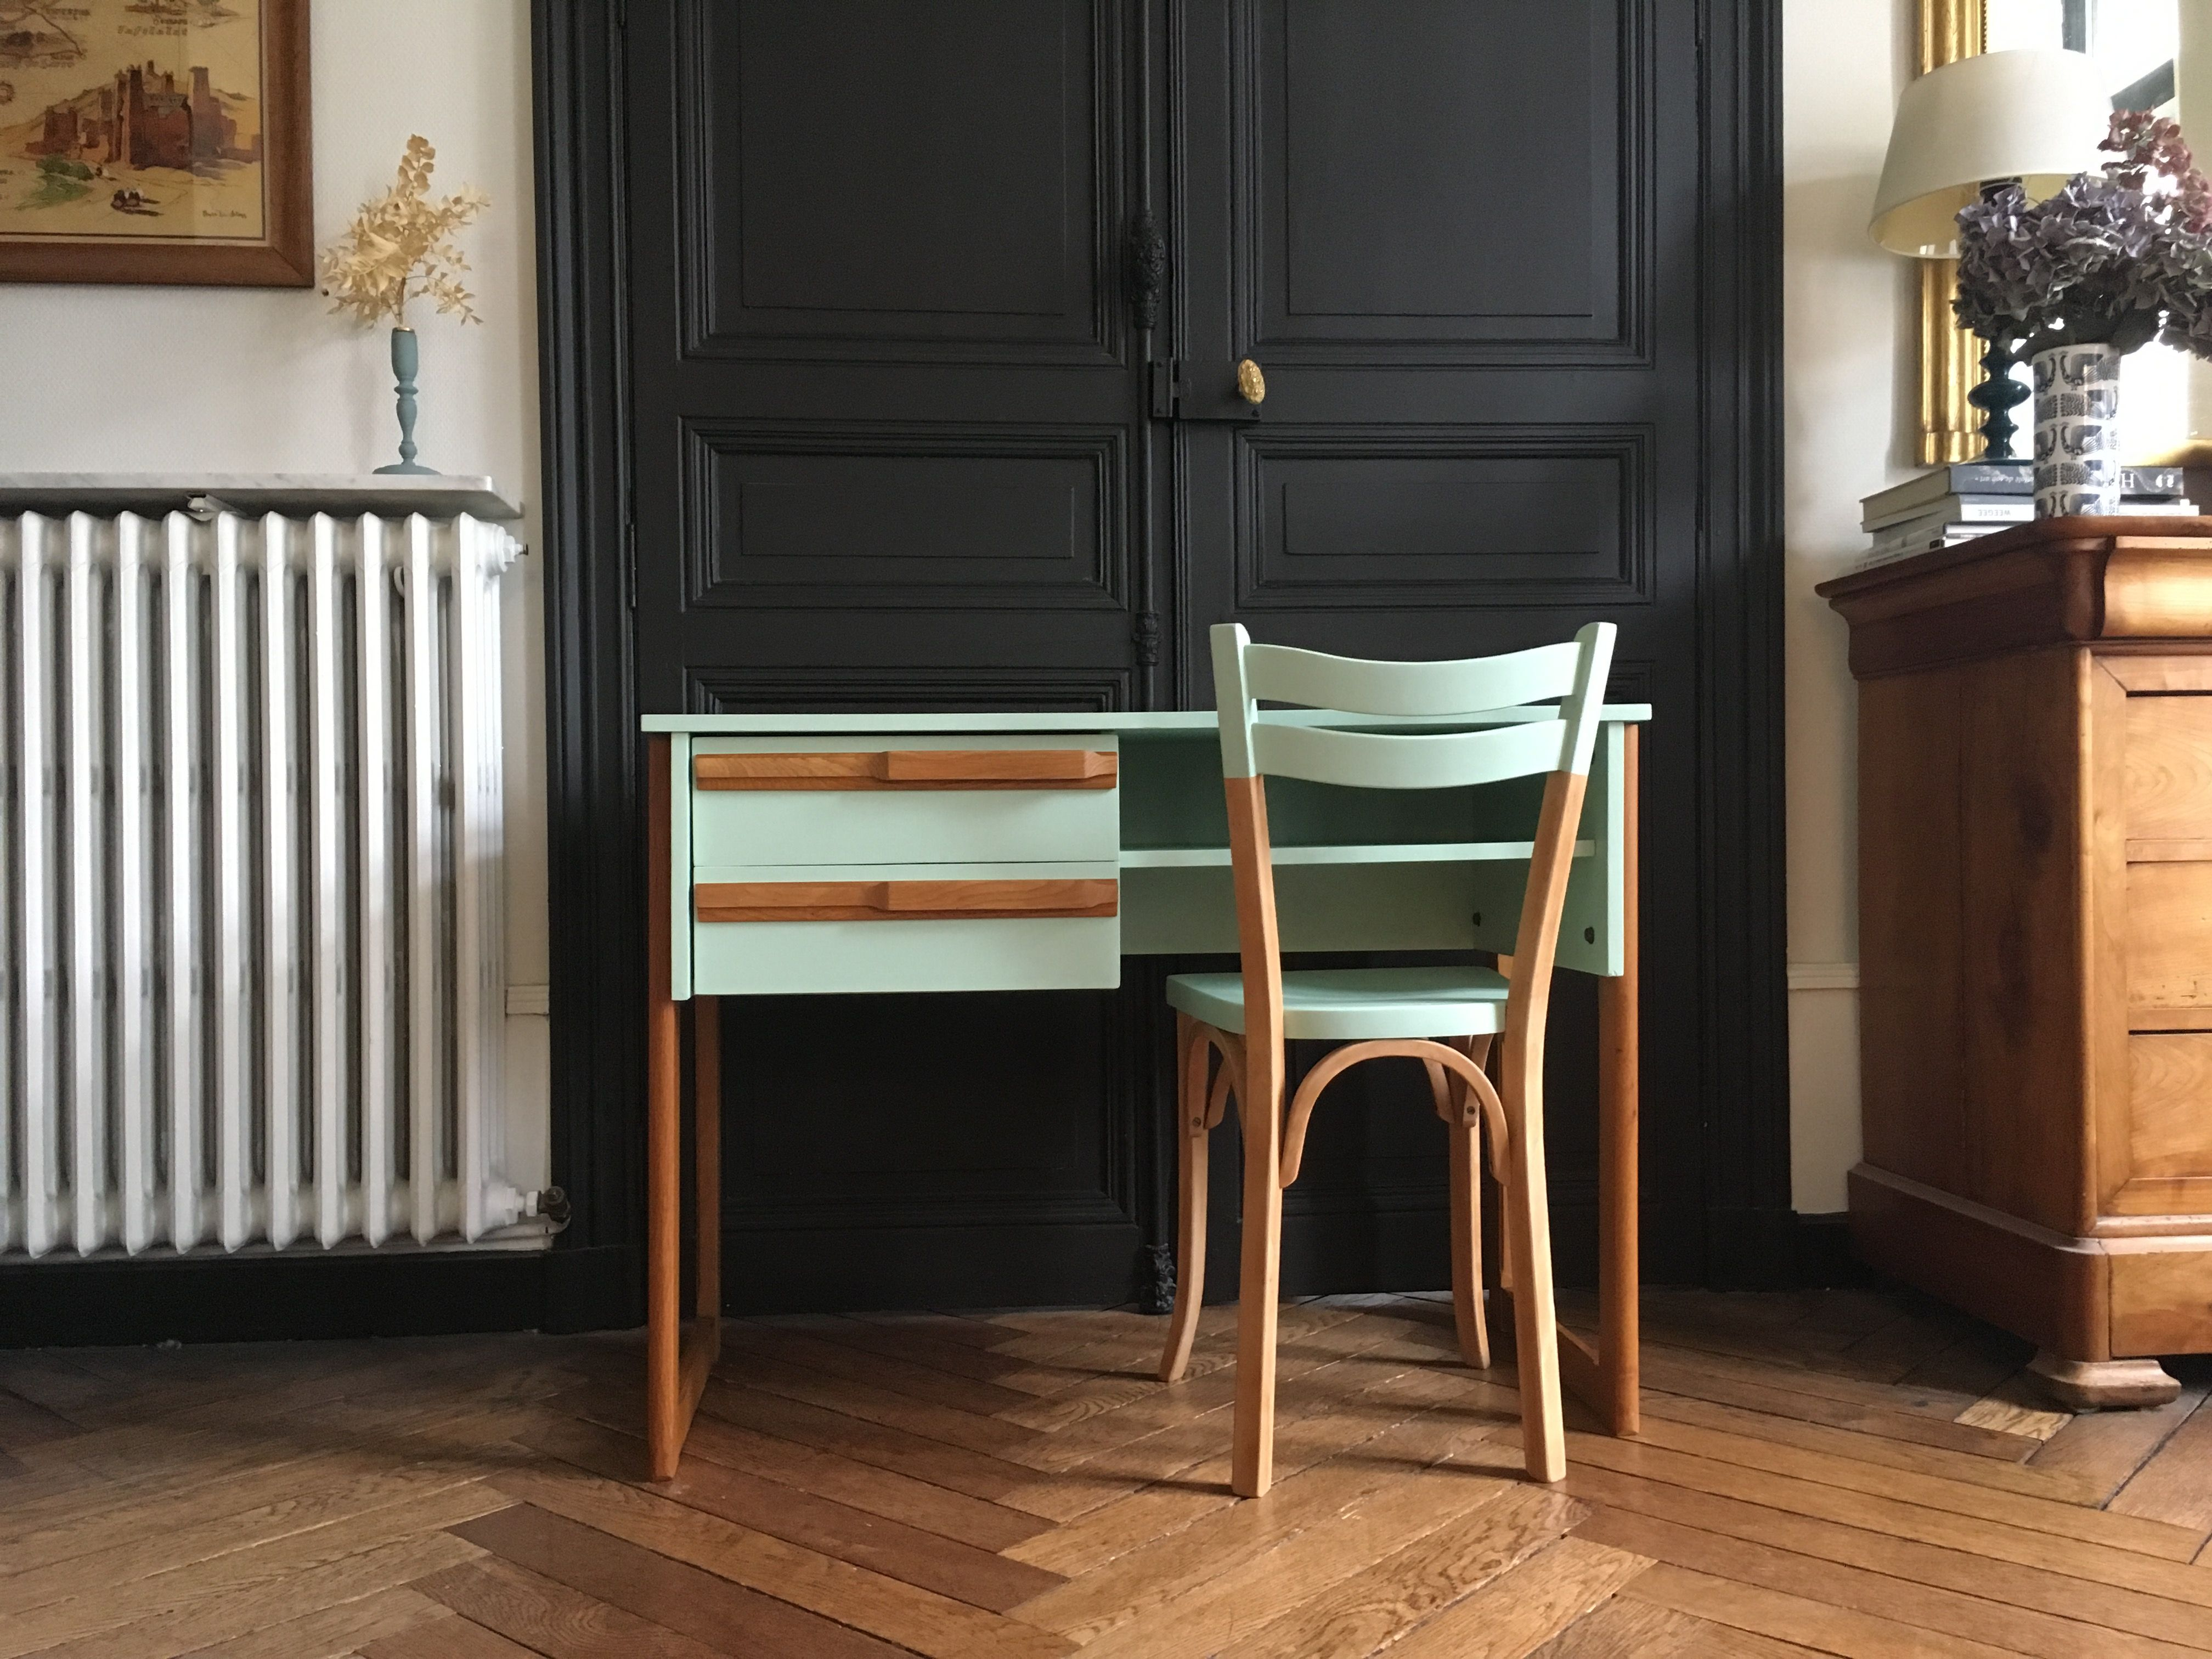 Bureau Vintage Scandinave Vert Celadon Meubles Vintage Nantes Home Decor Furniture Home